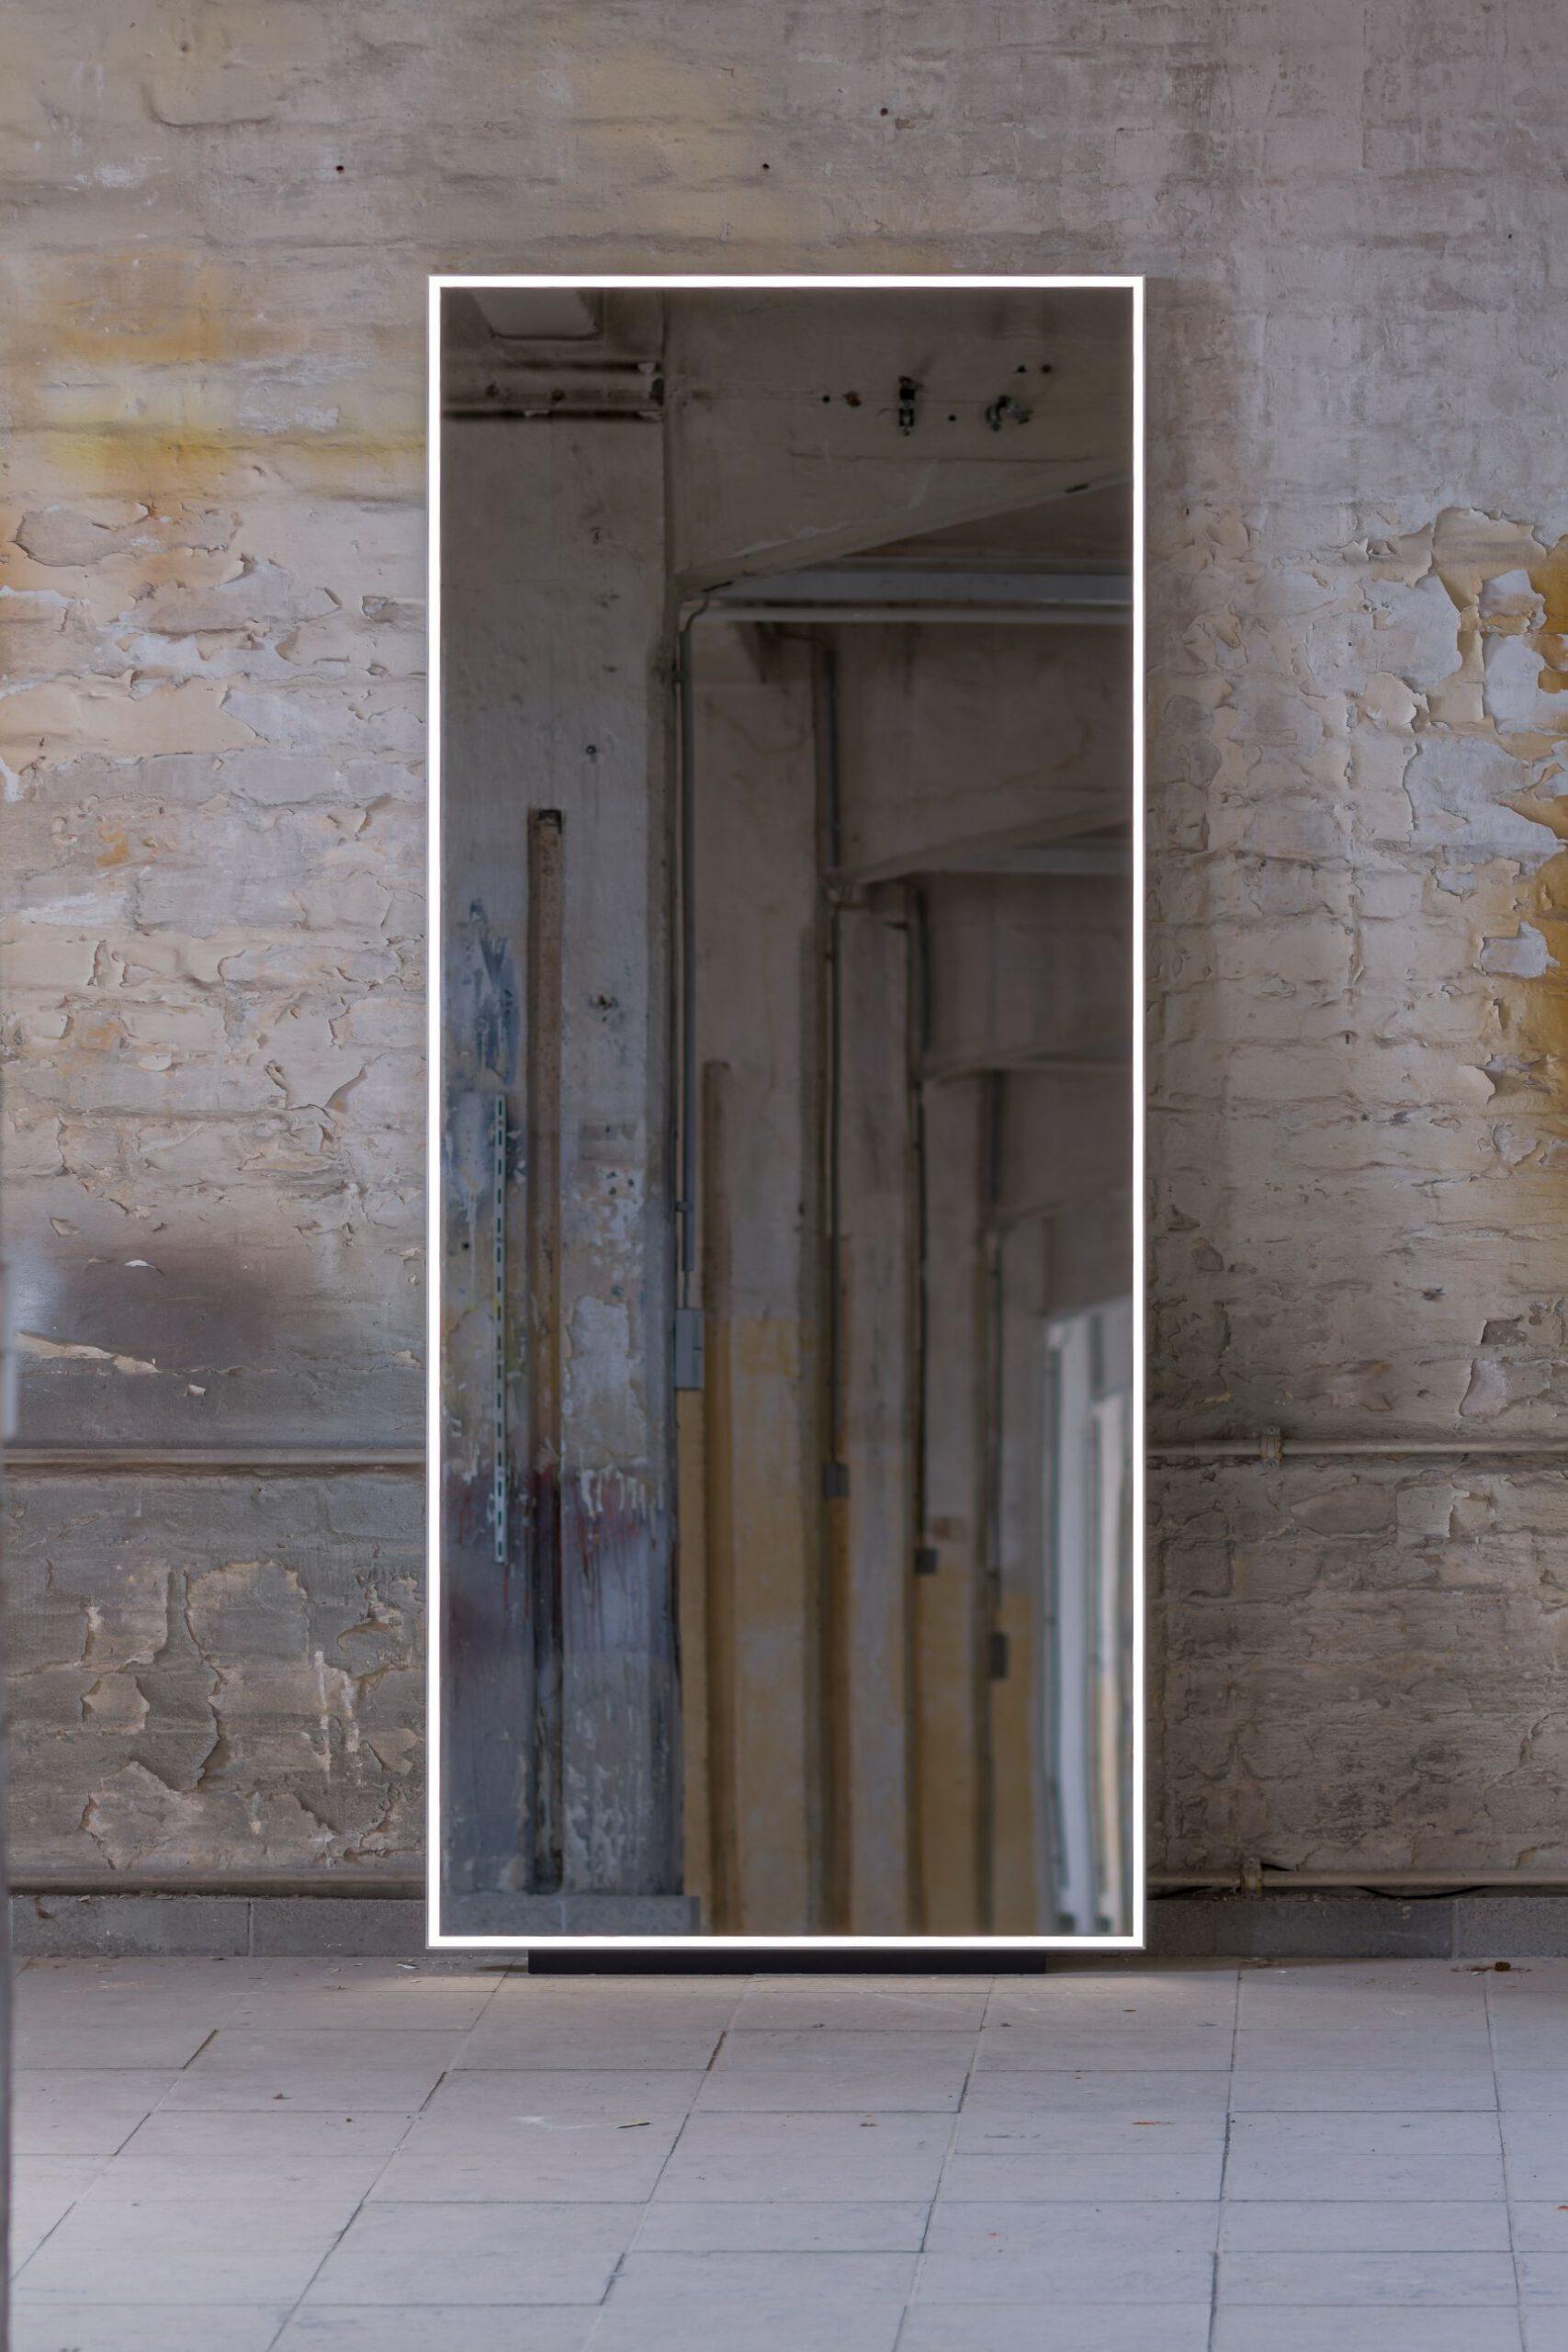 mirrorz-berlin_Spiegel_Fotografie_03_BrandDesign_LLiniany